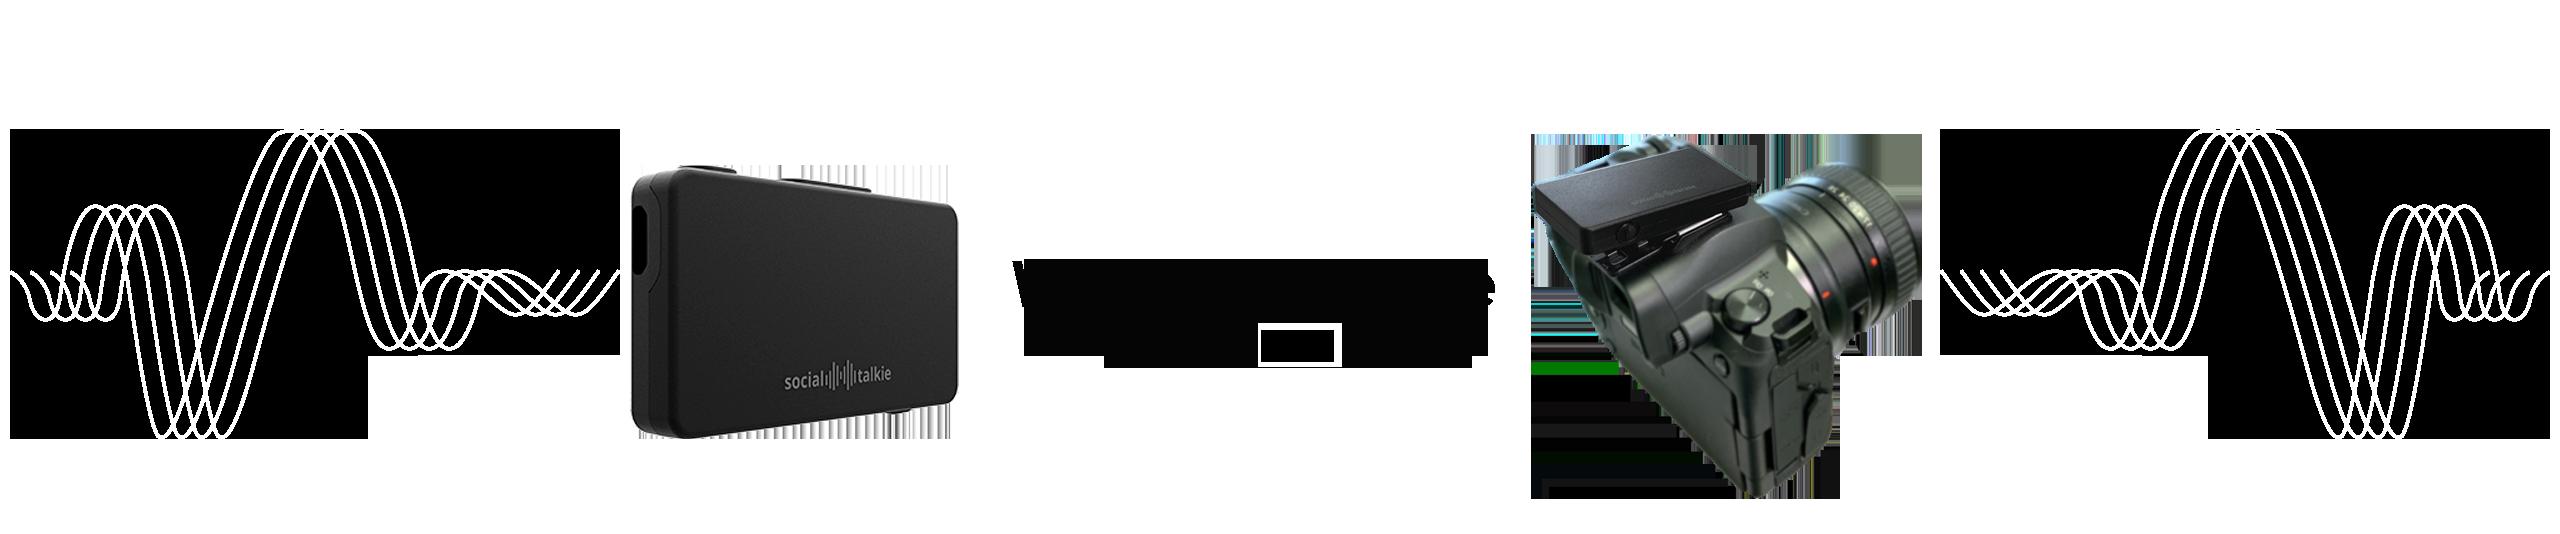 wireless-range_blue